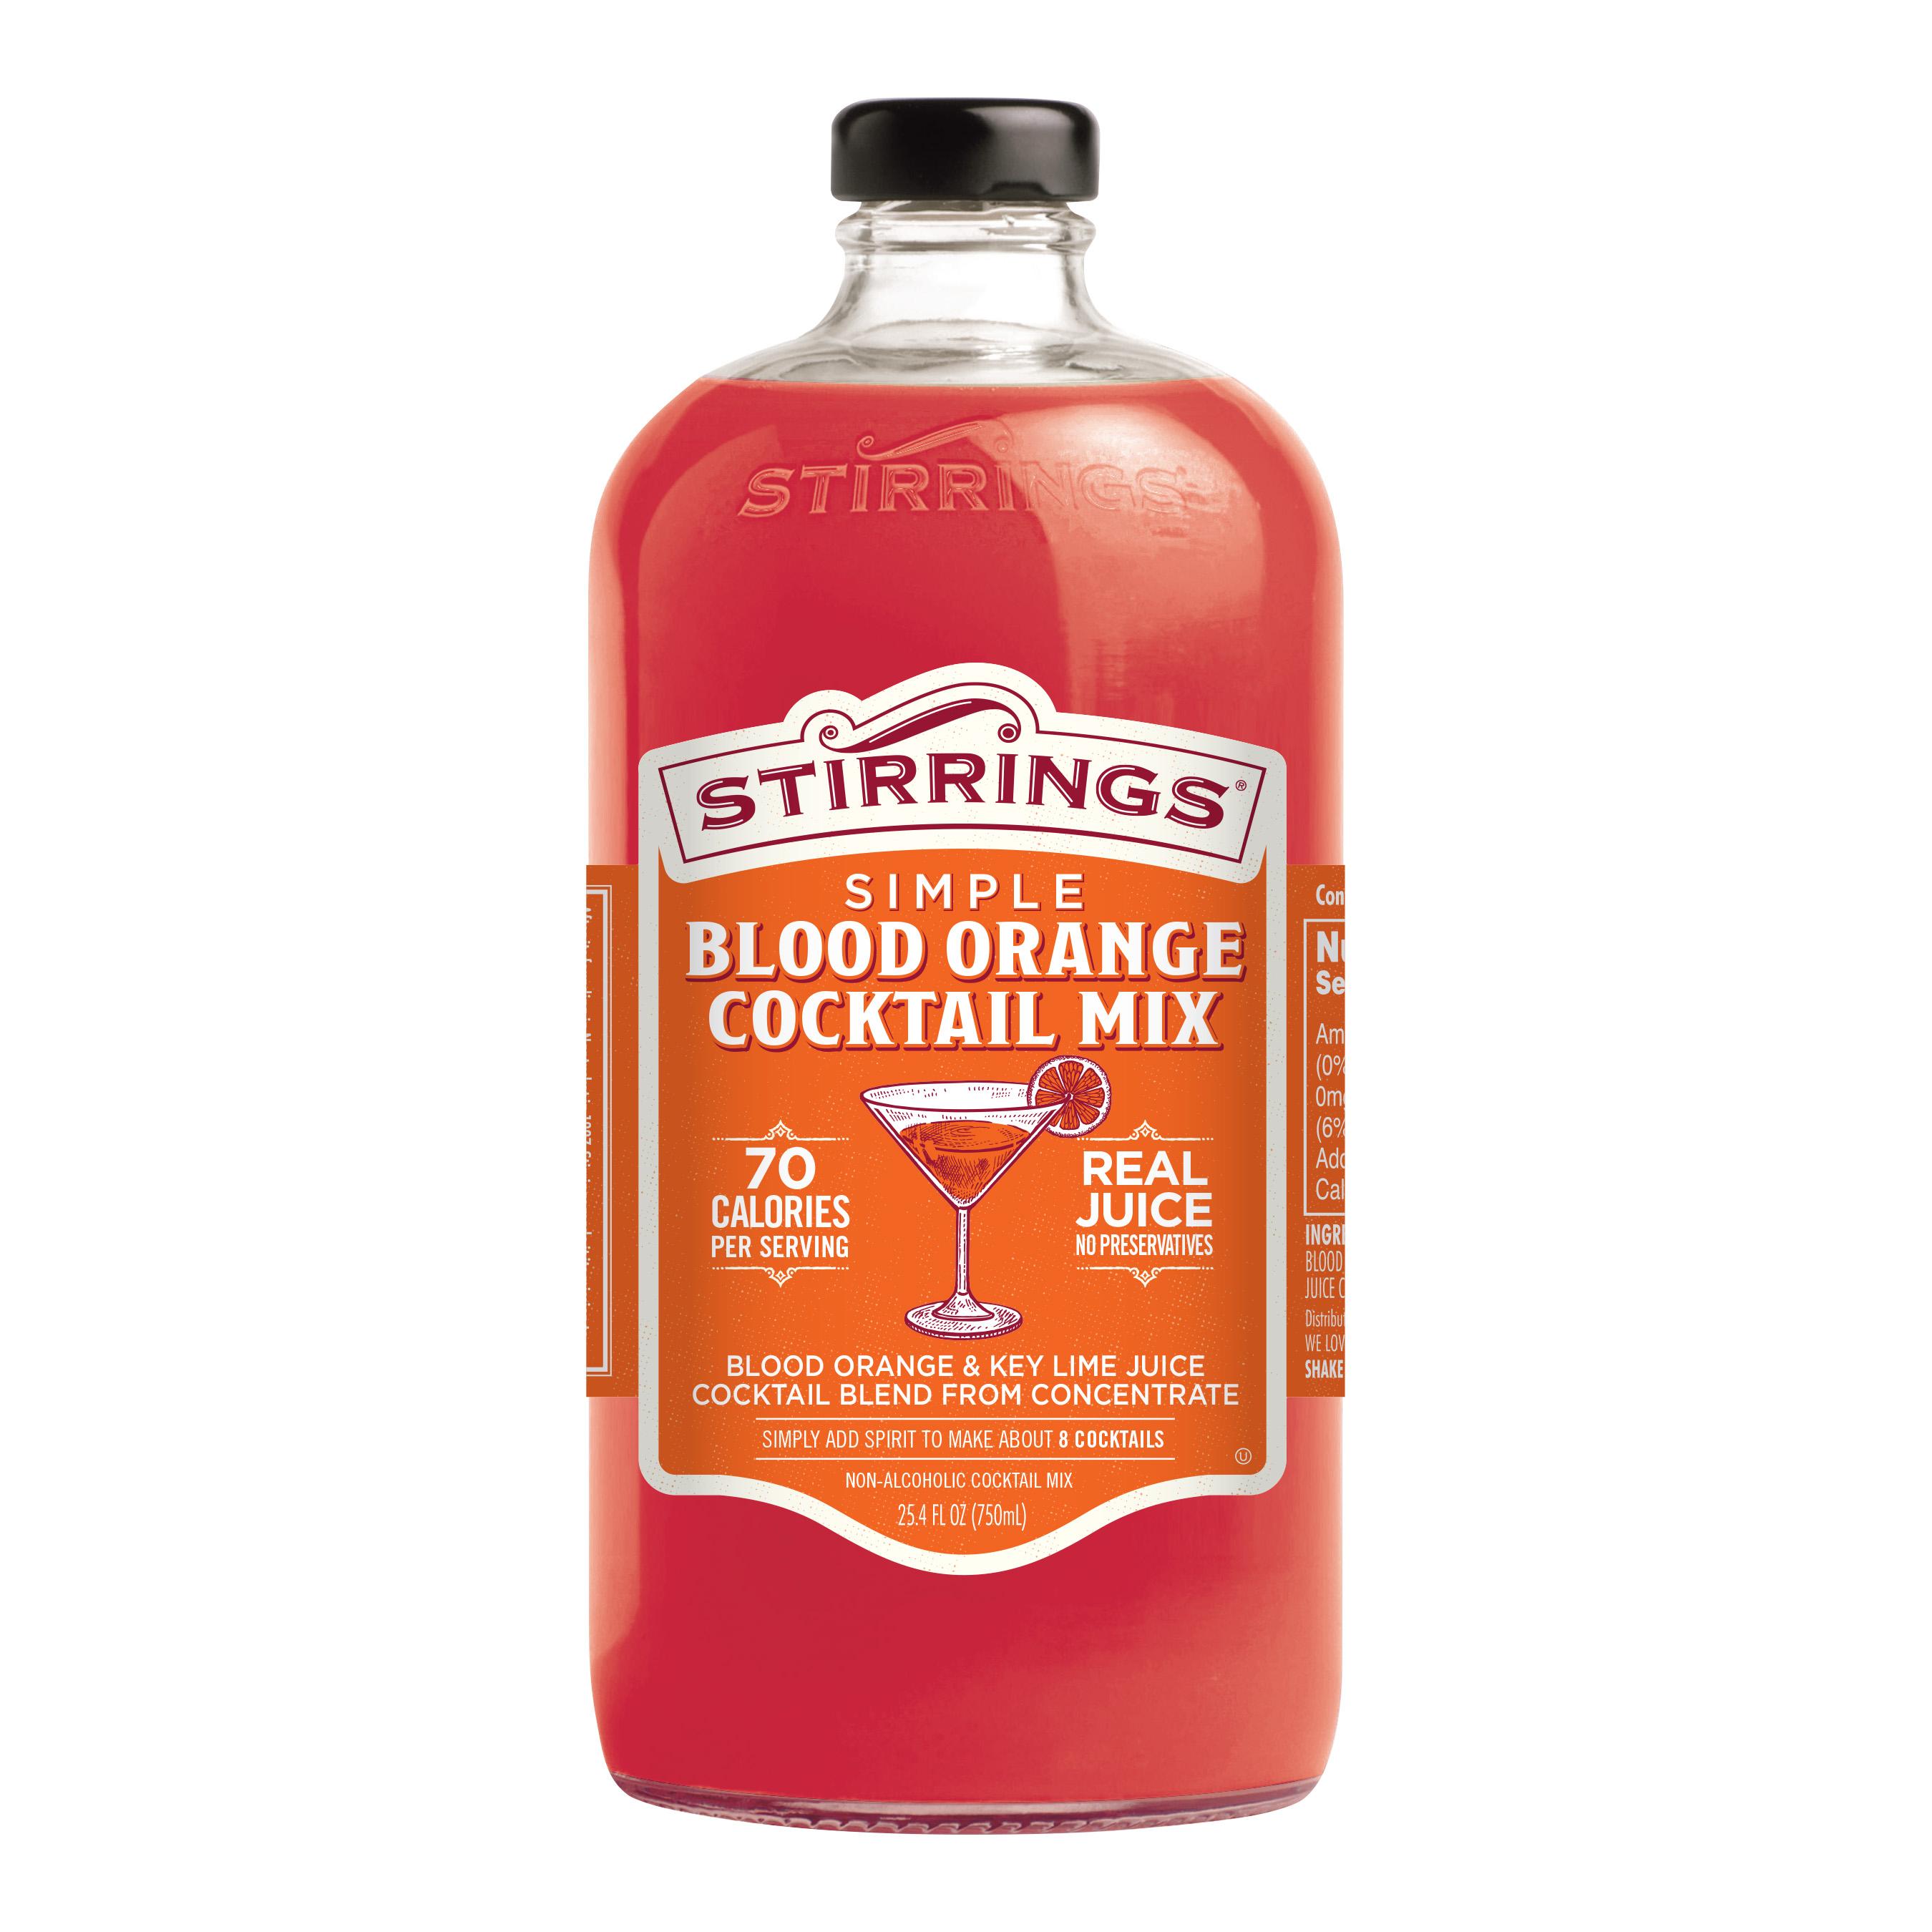 Blood Orange Cocktail Mix